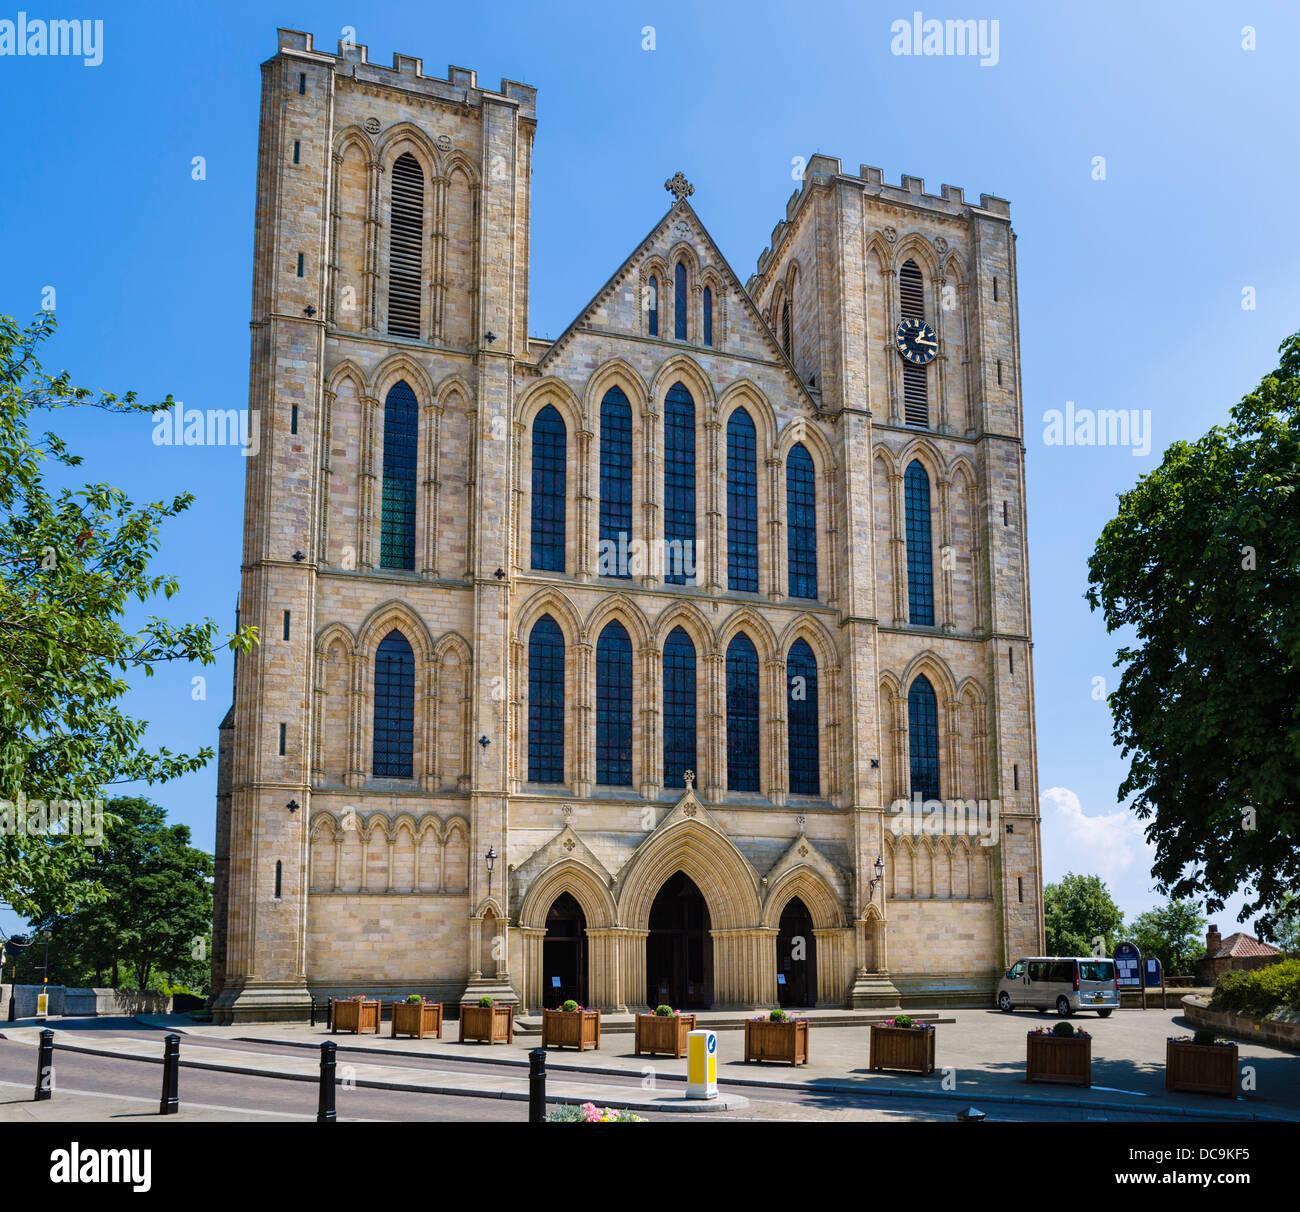 Fassade der Kathedrale von Ripon, Ripon, North Yorkshire, England, UK Stockbild